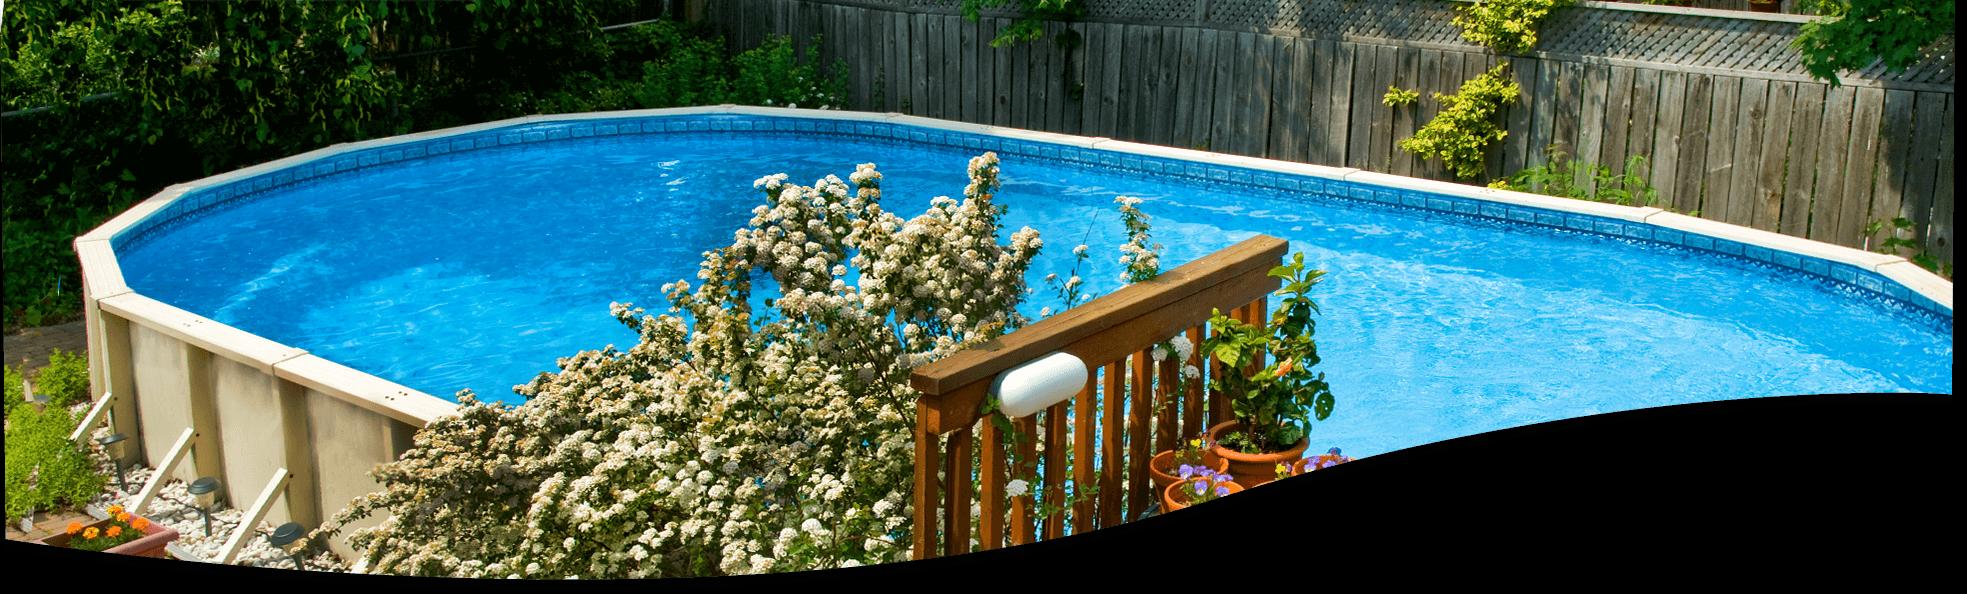 Piscine Hors Sol Portugal chauffage pour piscine hors-sol -